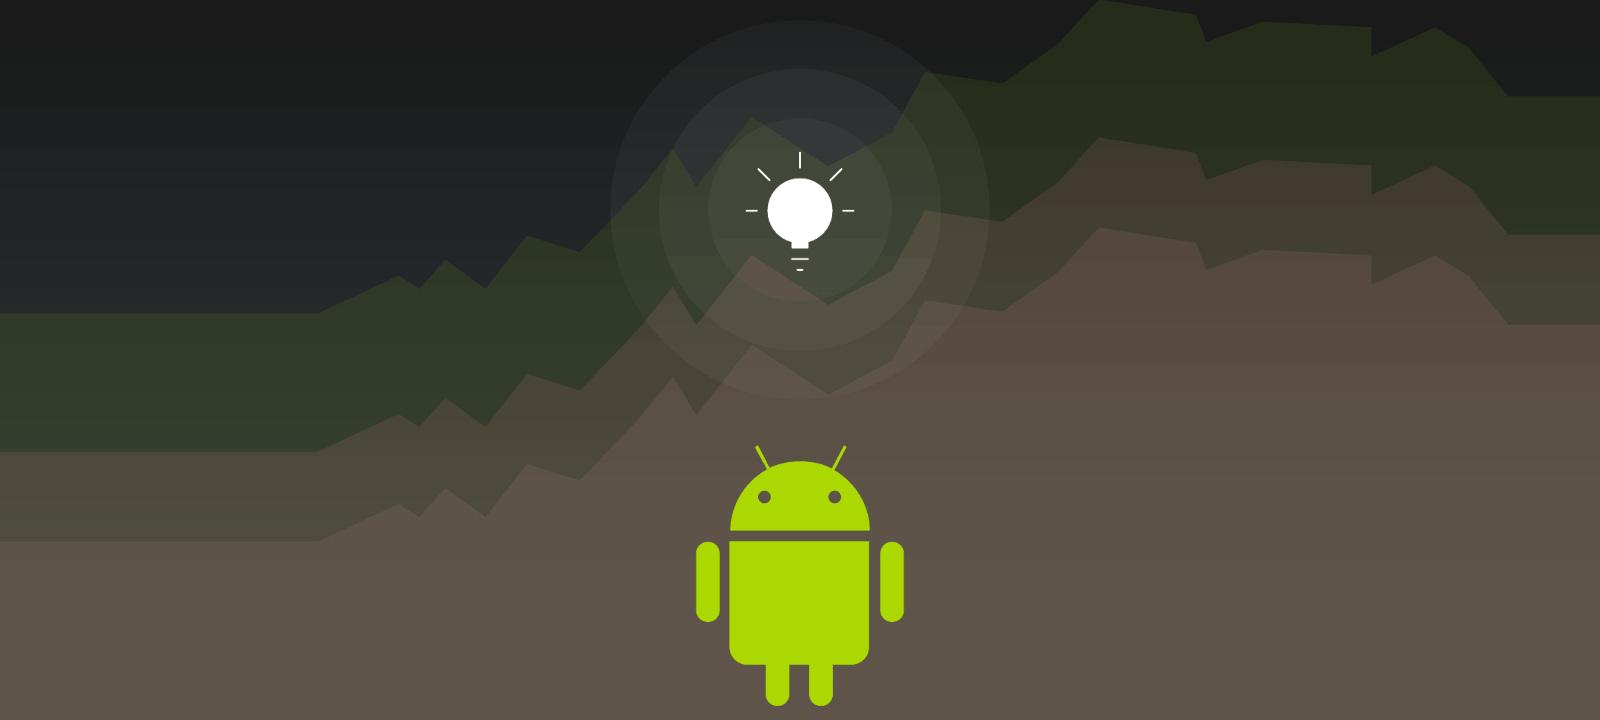 Android: идентификация по обоям и security-новшества Android 12